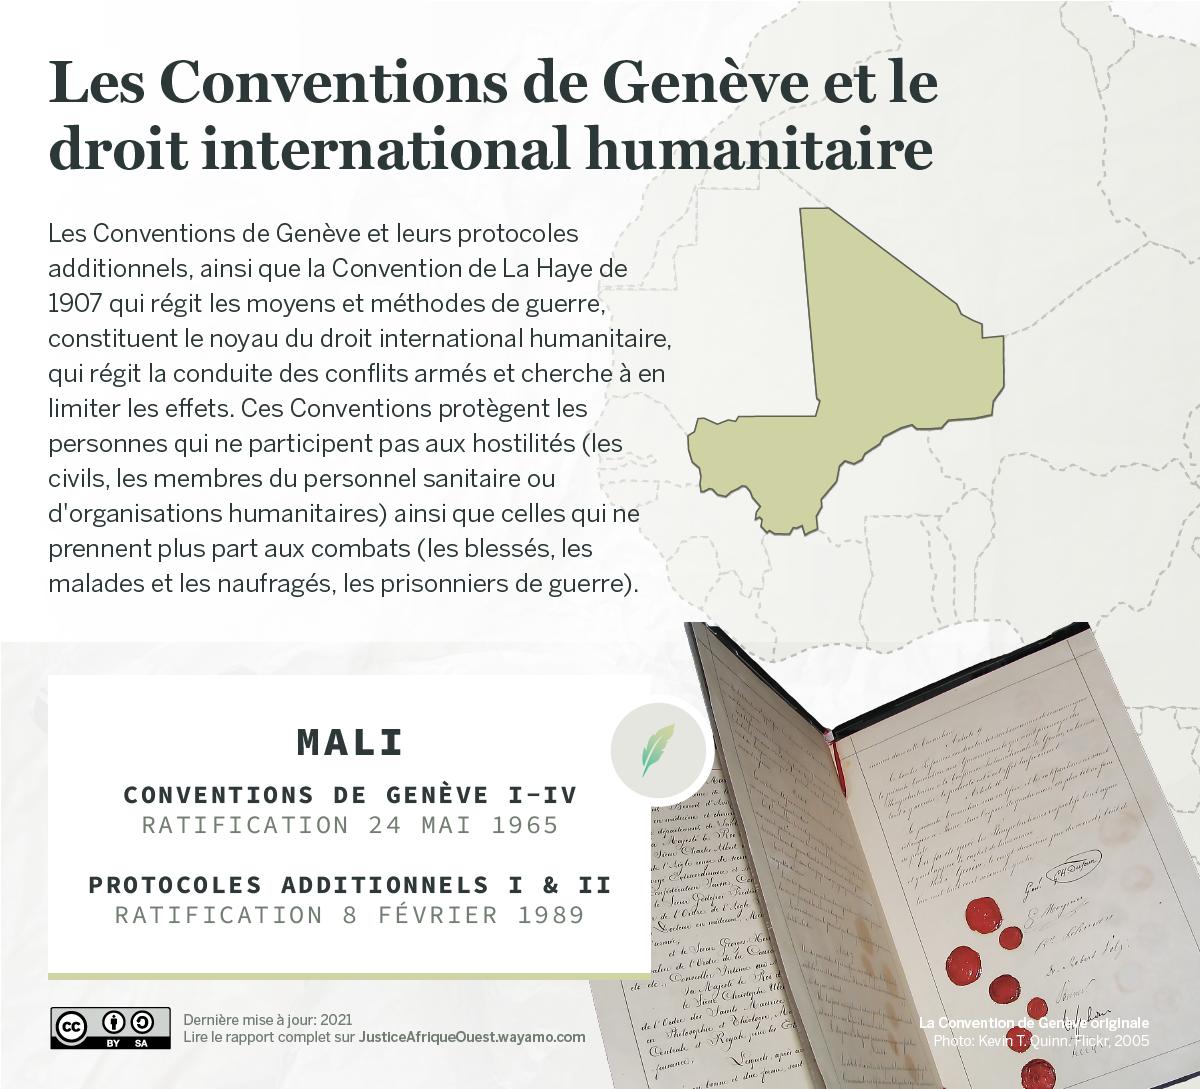 MALI_Conventions de Genève - Wayamo Foundation (CC BY-SA 4.0)